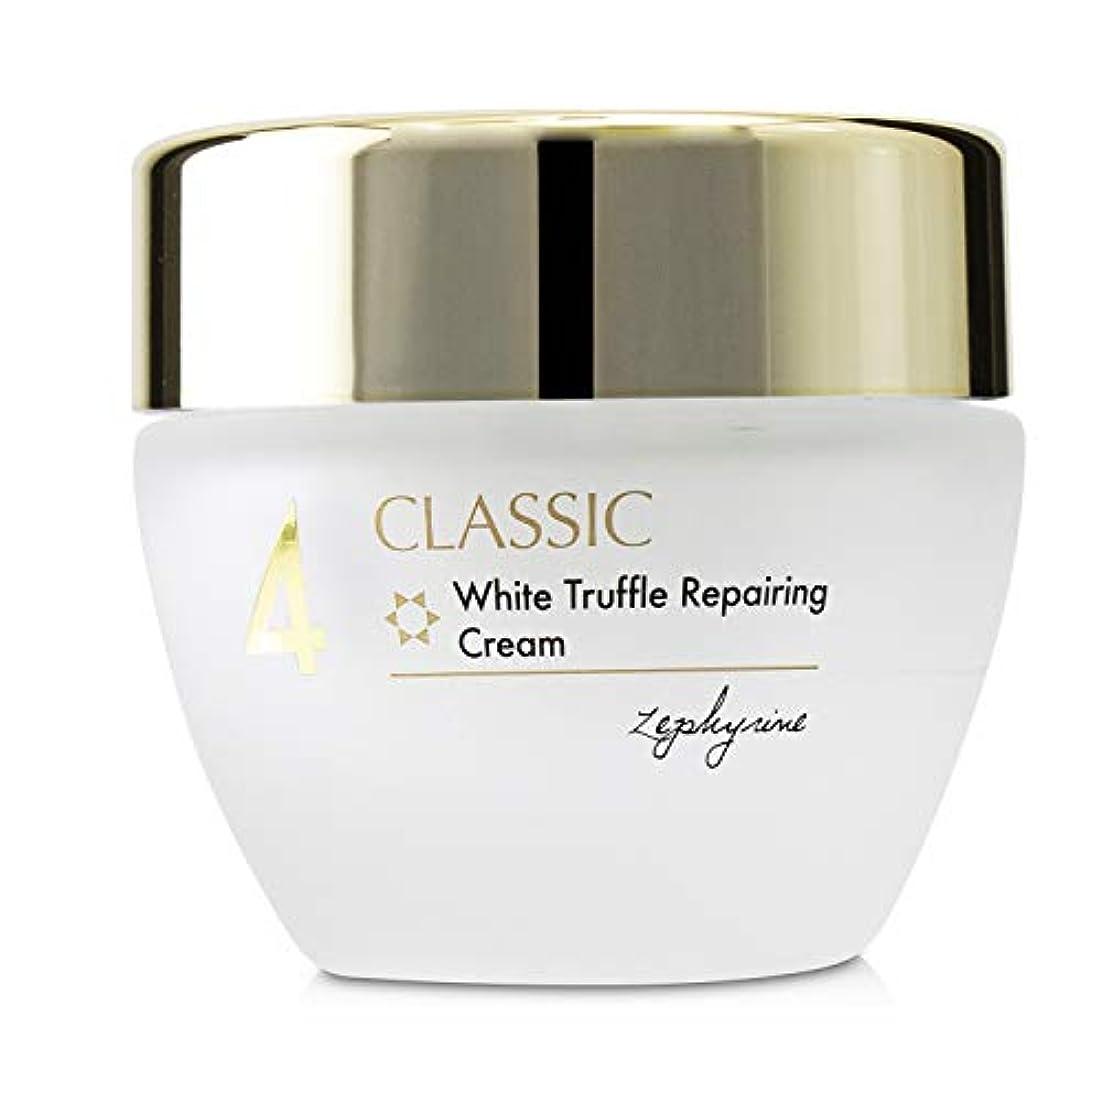 債務者姪農民Zephyrine White Truffle Repairing Cream 50ml/1.7oz並行輸入品